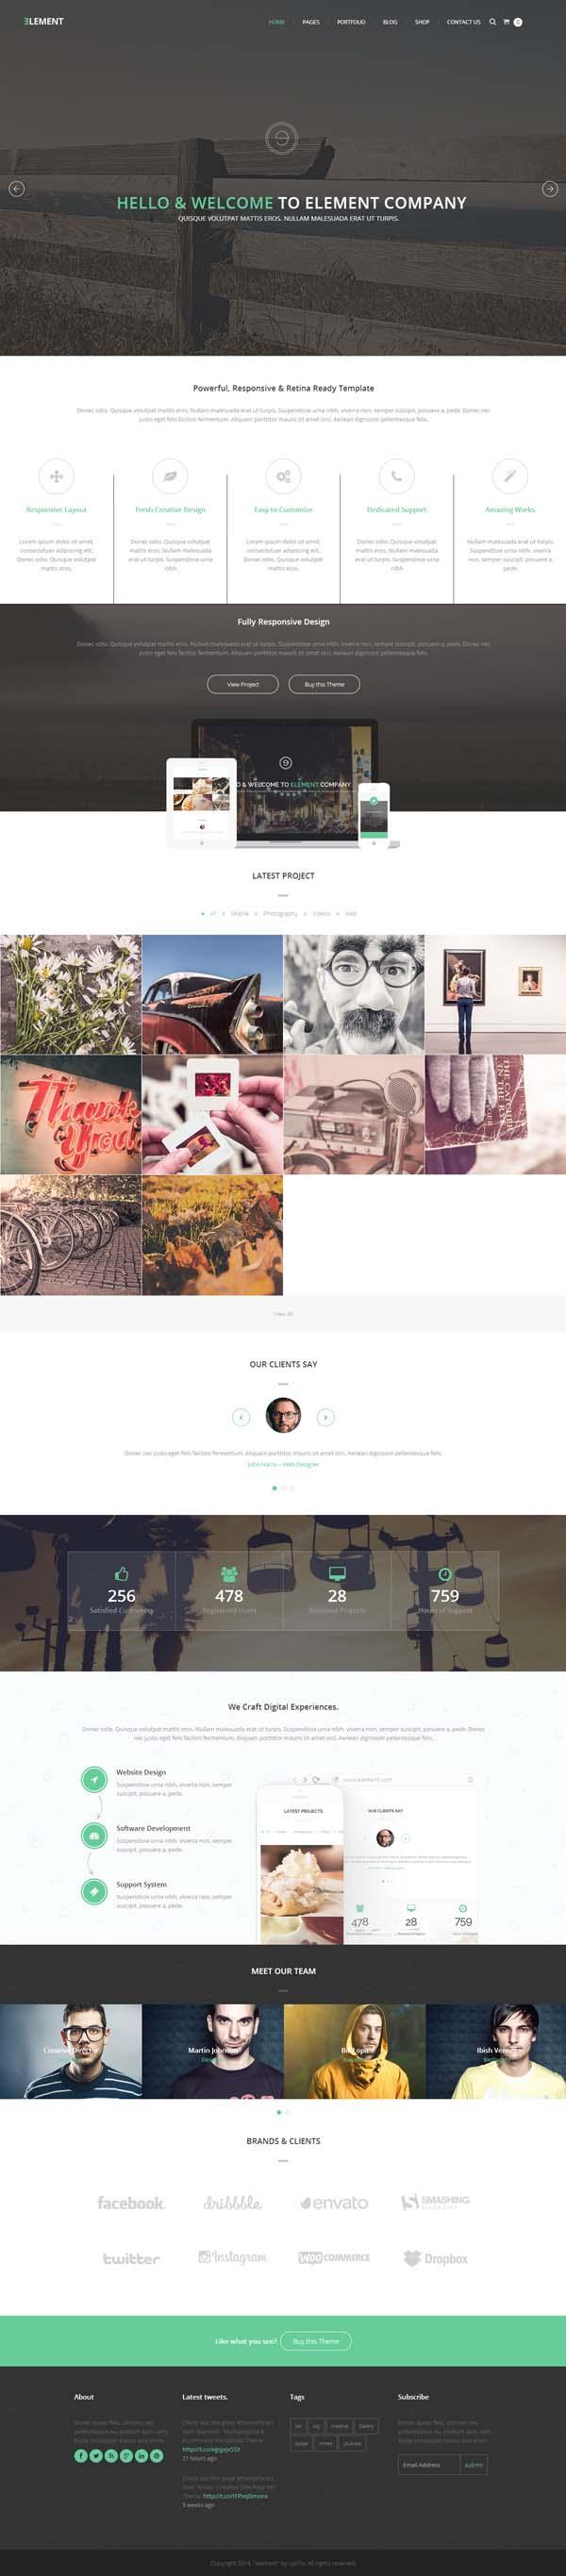 Element - Responsive Multipurpose WordPress Theme